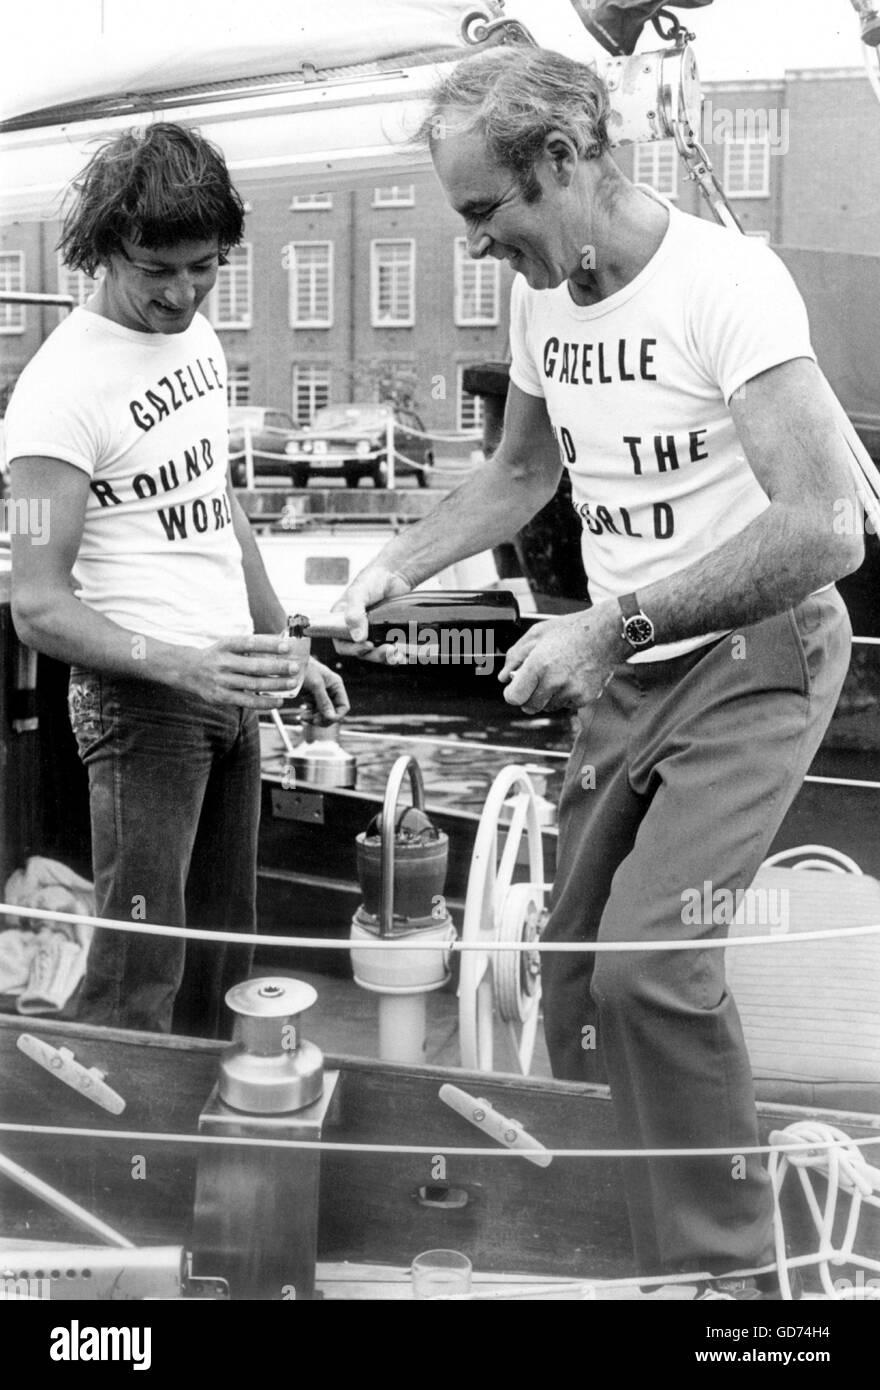 AJAX NEWS PHOTOS. 1974. PORTSMOUTH, ENGLAND.  - WHITBREAD ROUND THE WORLD RACE - BRUCE WEBB, 53, (RIGHT) CELEBRATES - Stock Image